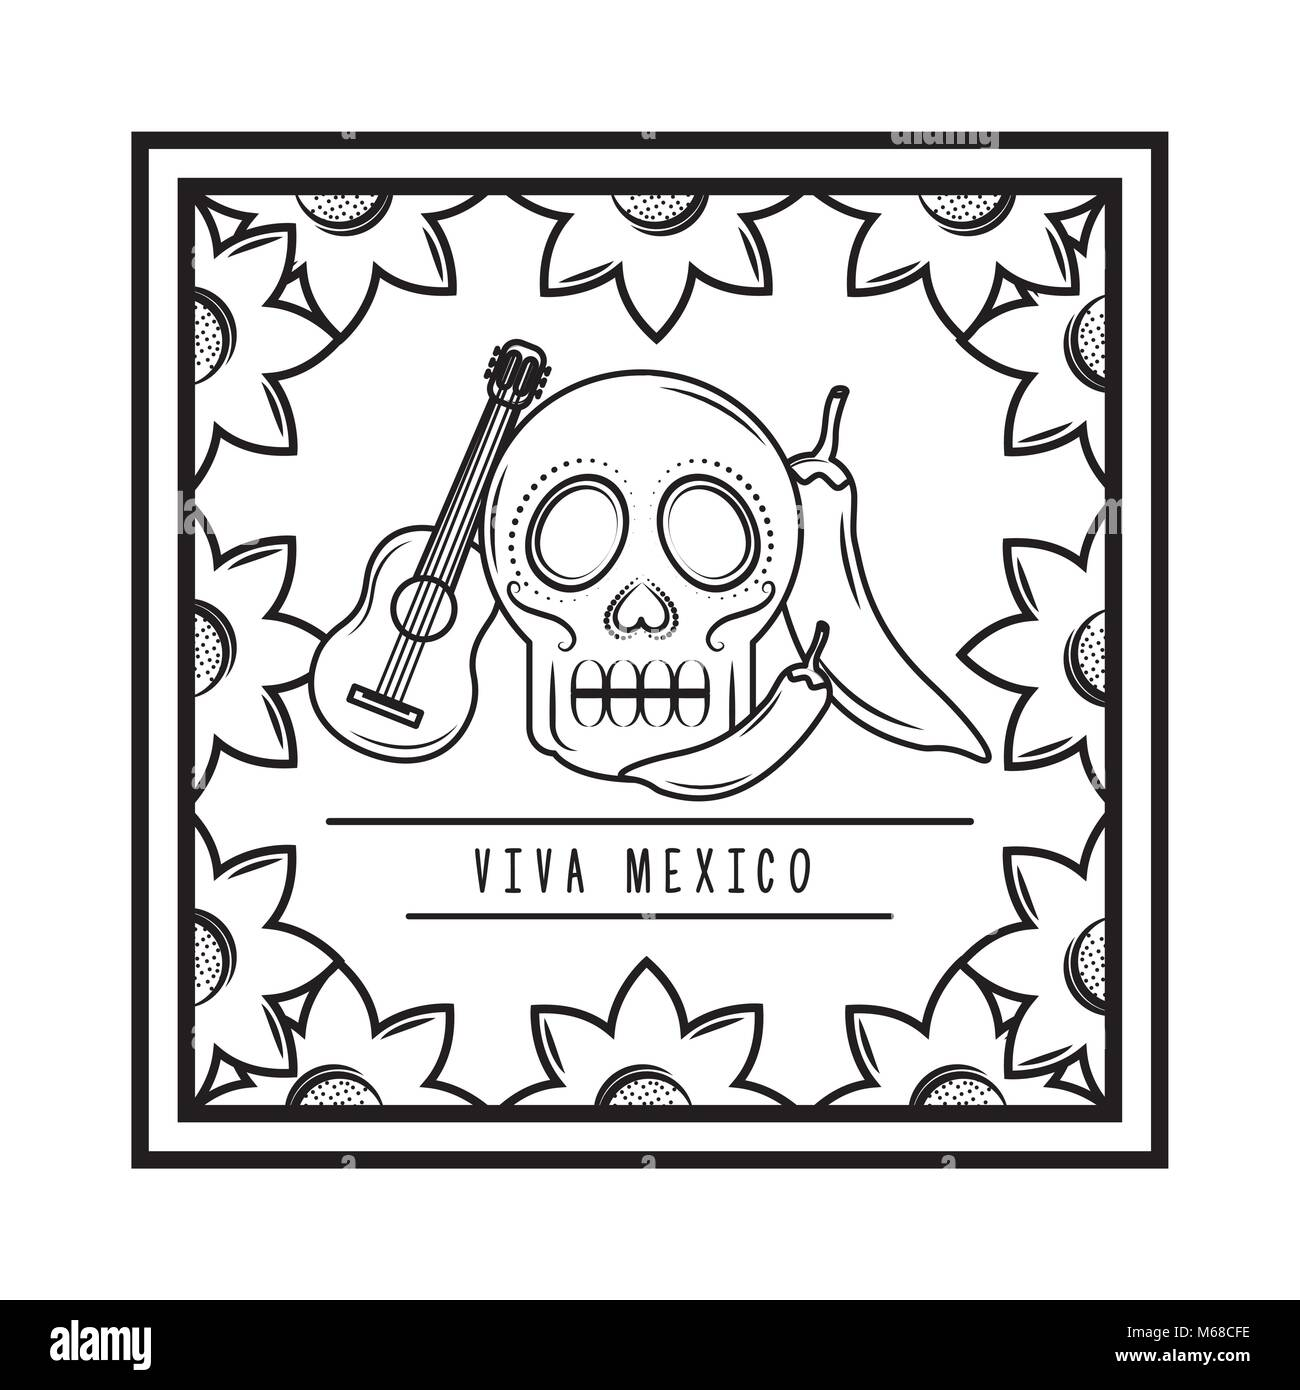 Viva México cráneo guitarra chili pepper marco floral ilustración ...